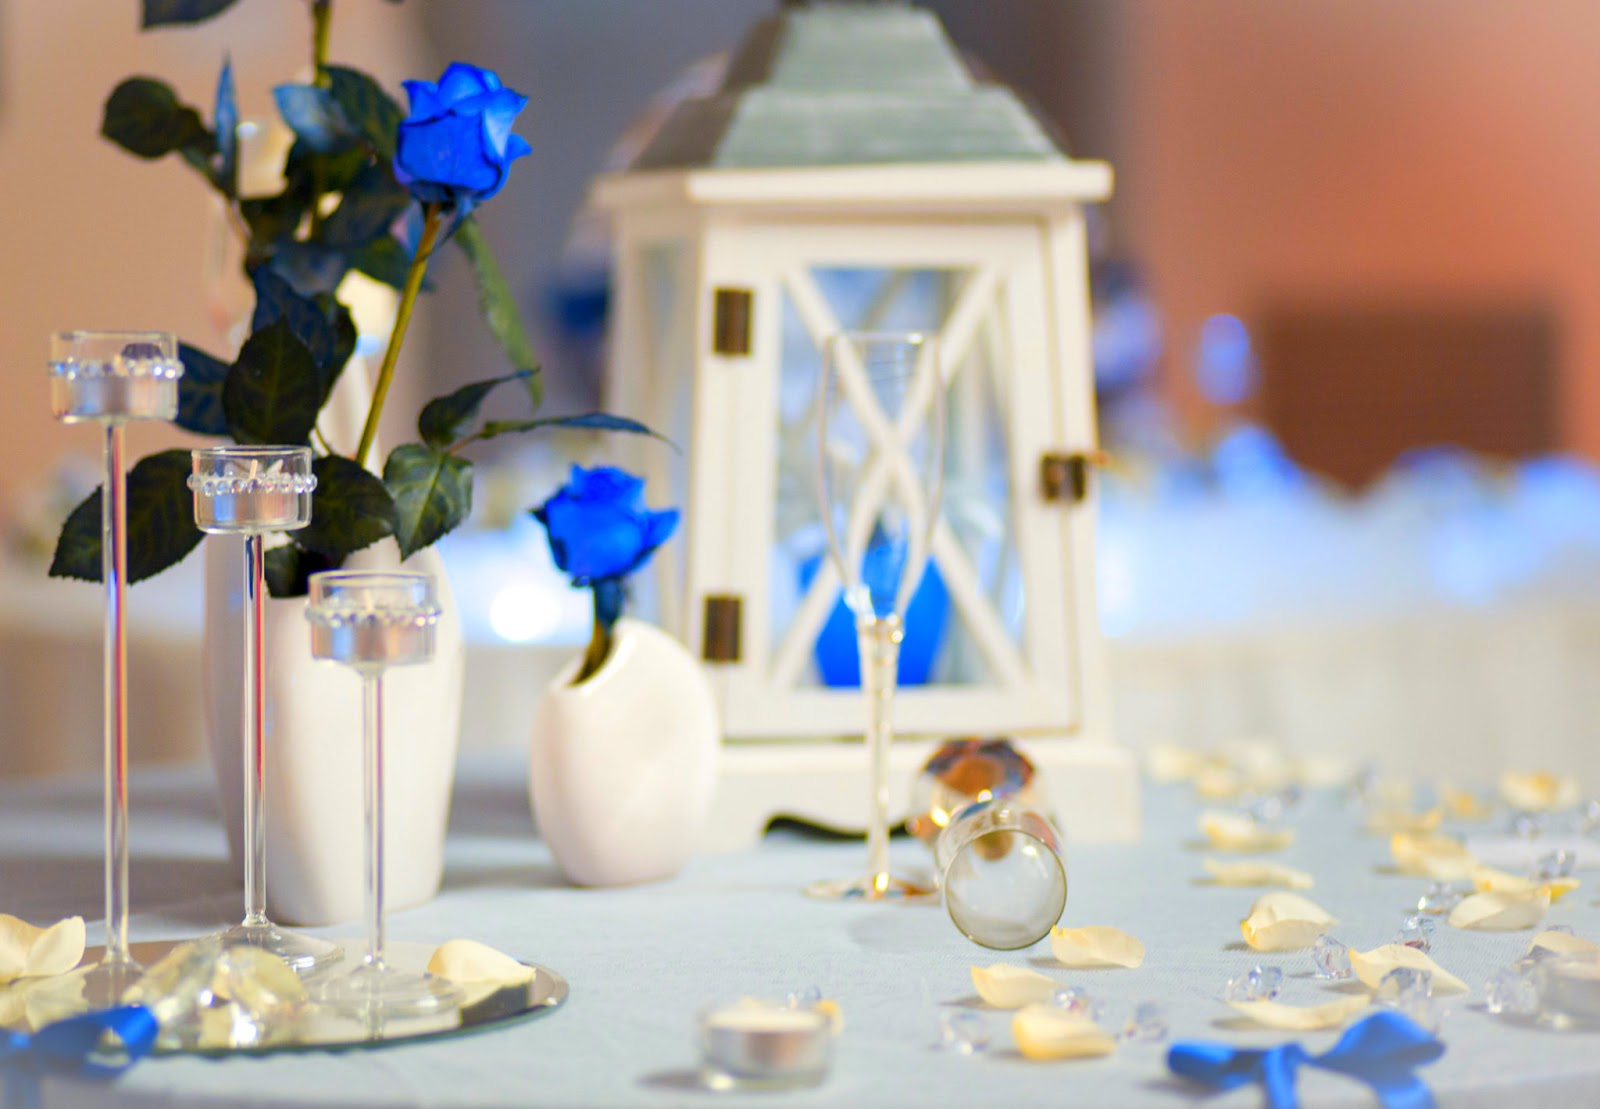 Tema Matrimonio Blu E Bianco : Altri spunti per matrimonio bianco e blu wedding